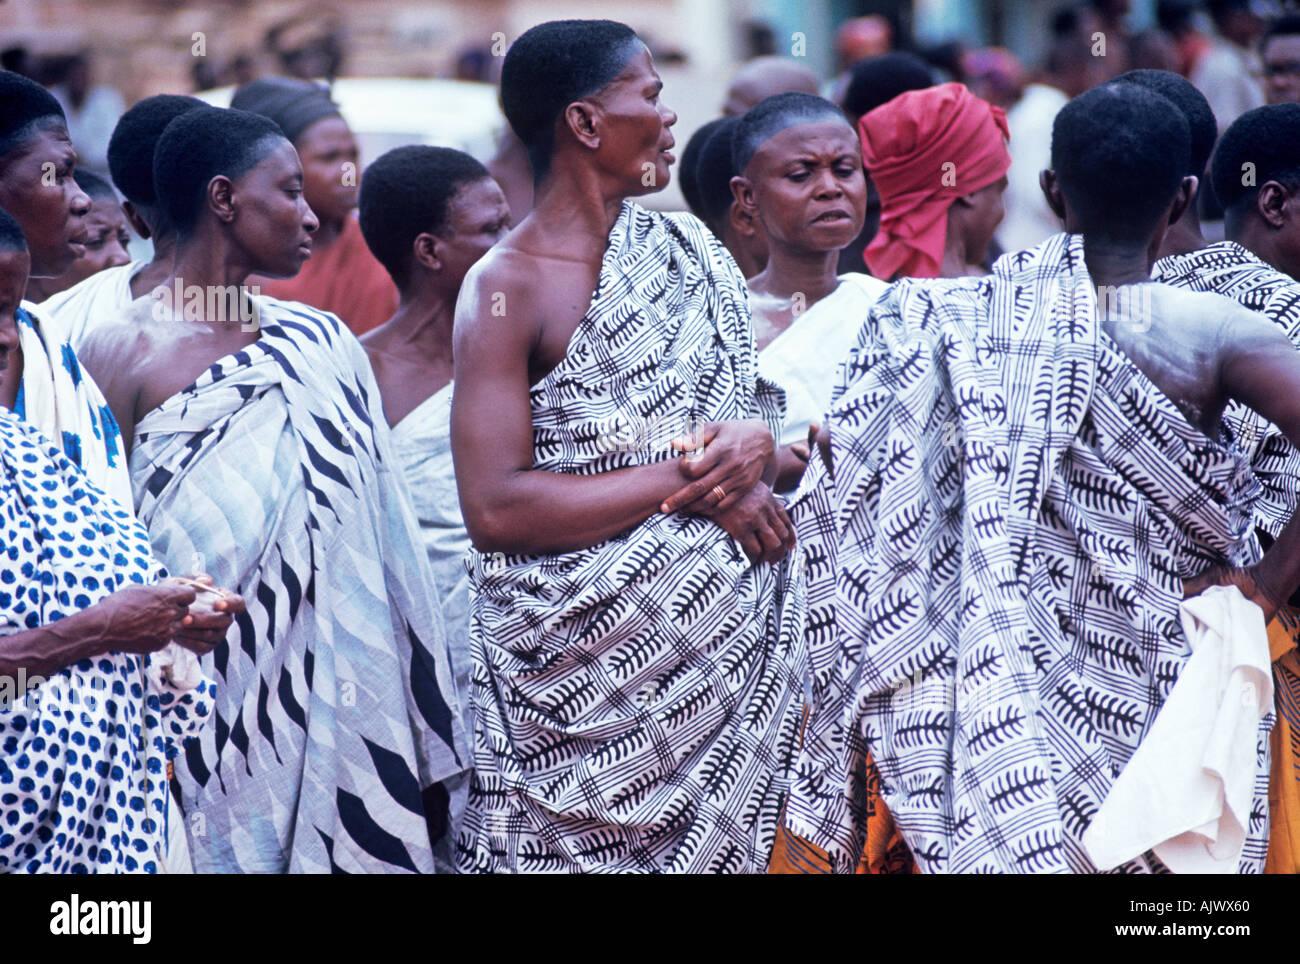 Matriarchal Society Stock Photos & Matriarchal Society Stock Images